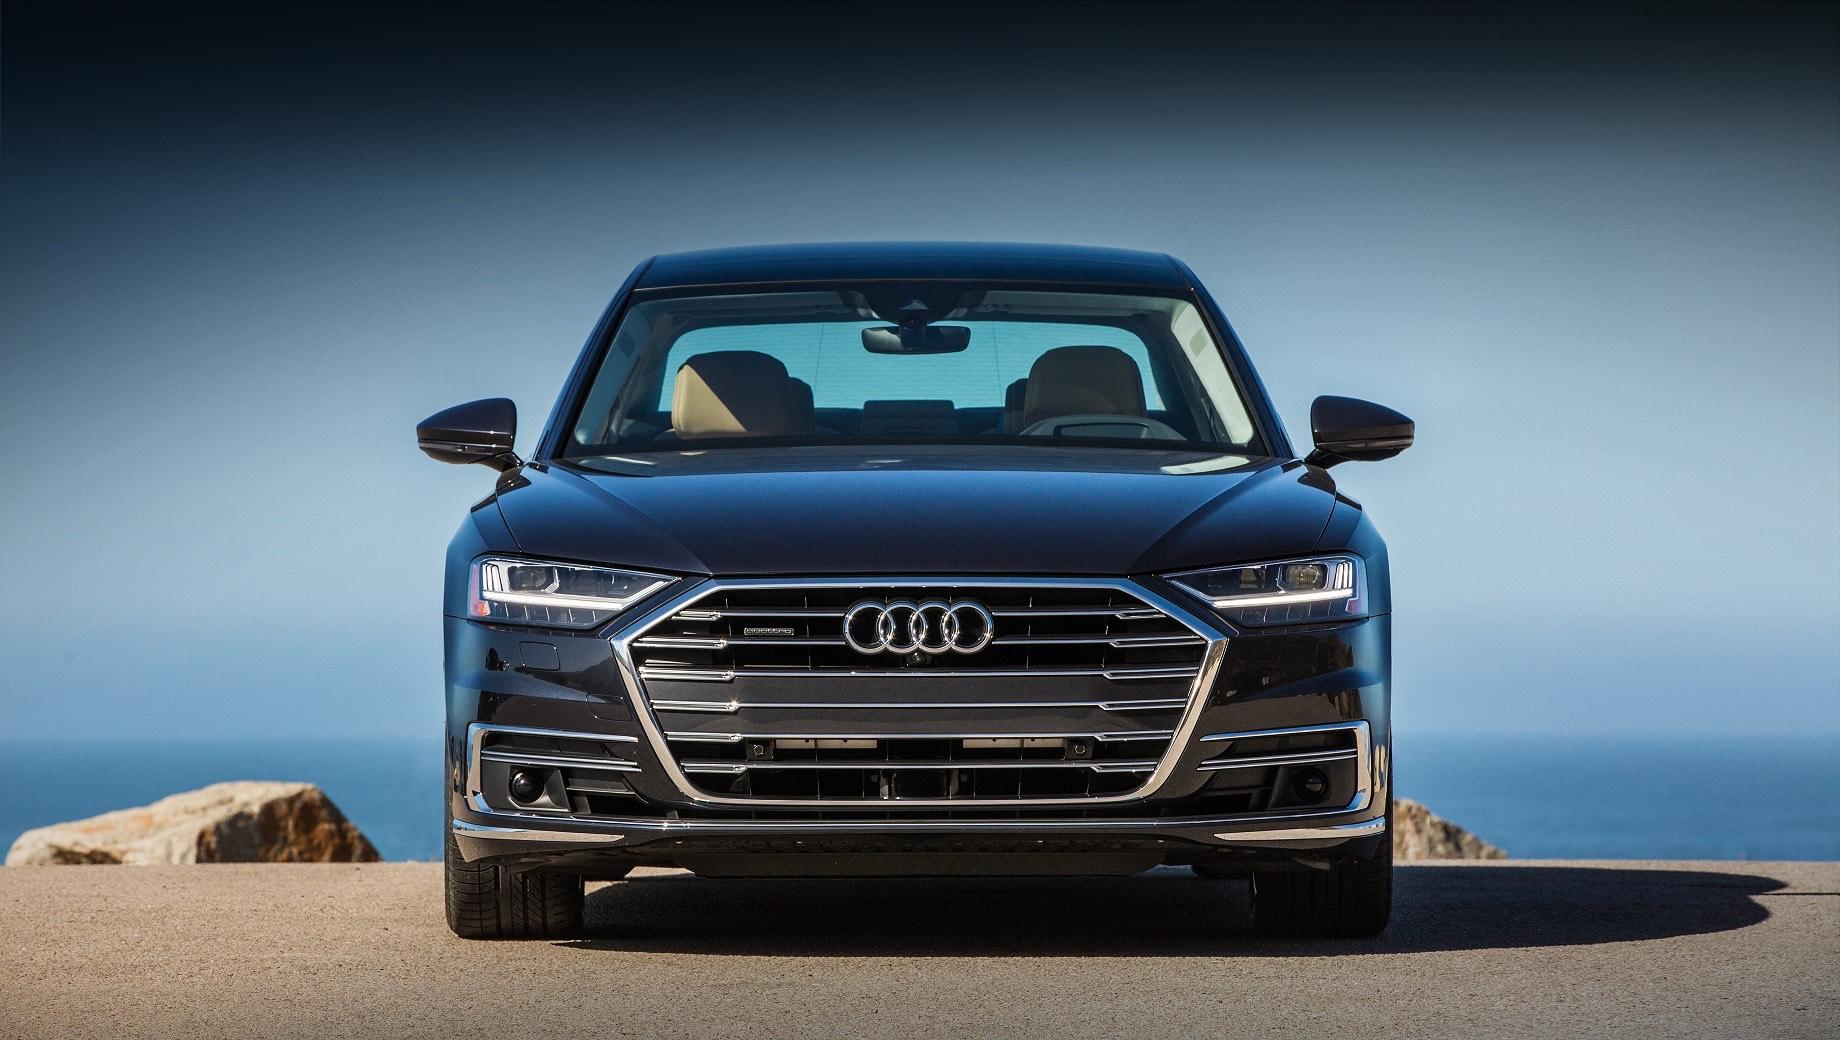 Седан Audi A8 в исполнении Horch замечен на дорогах